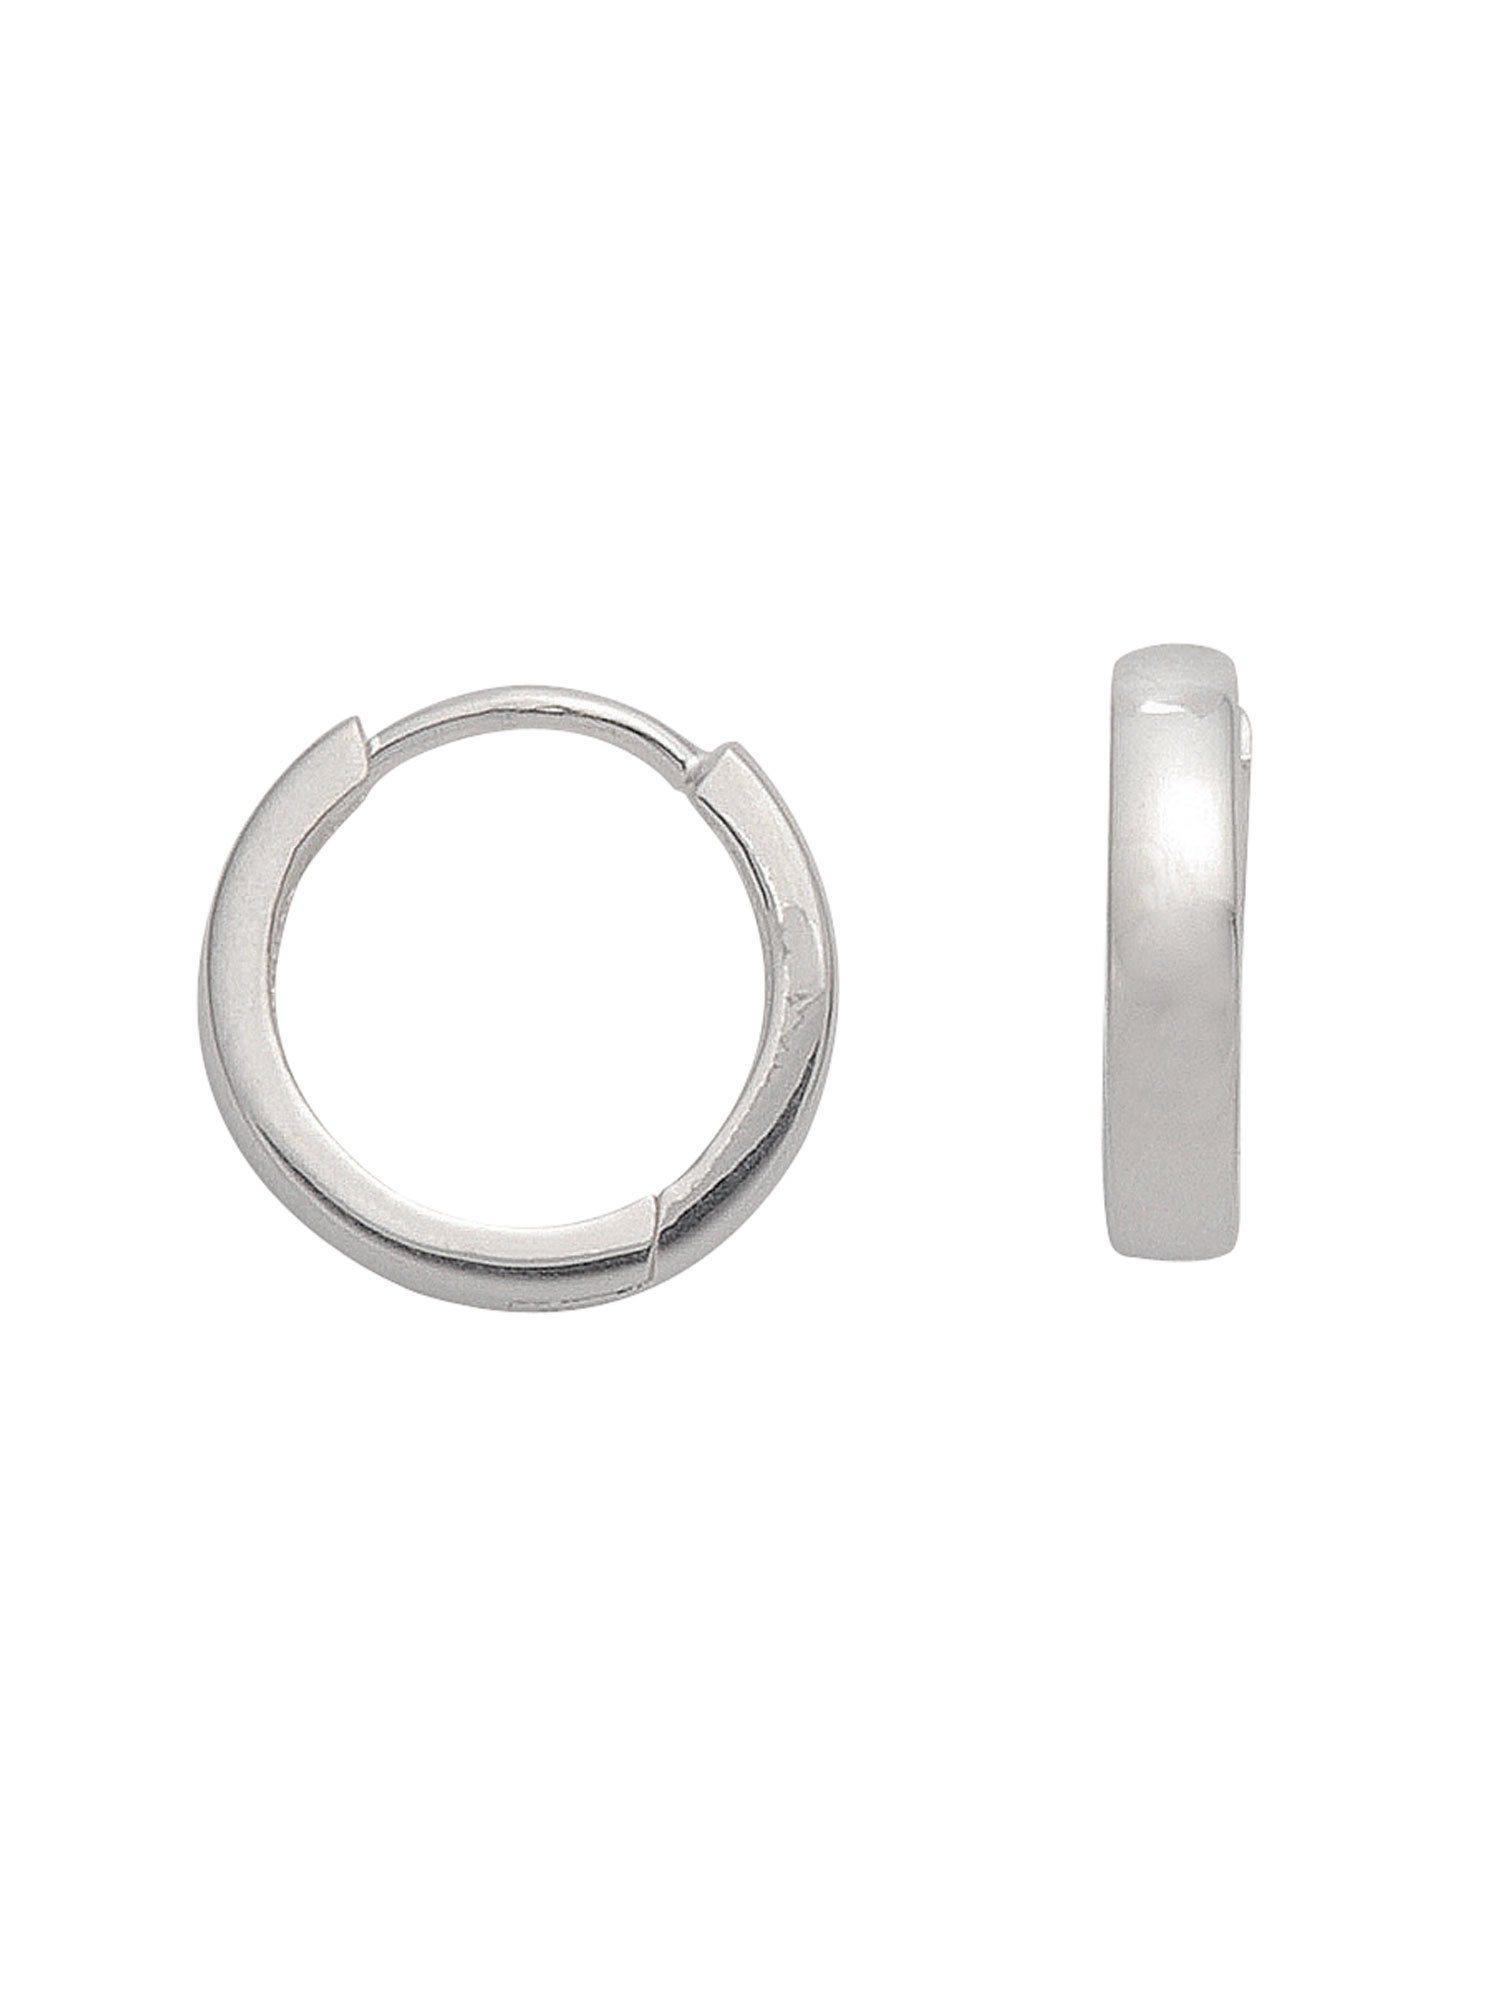 Adelia´s Paar Creolen »Silber Ohrringe« 925 Sterling Silber Ø 1.4 cm | Schmuck > Ohrschmuck & Ohrringe > Creolen | Silber | Adelia´s